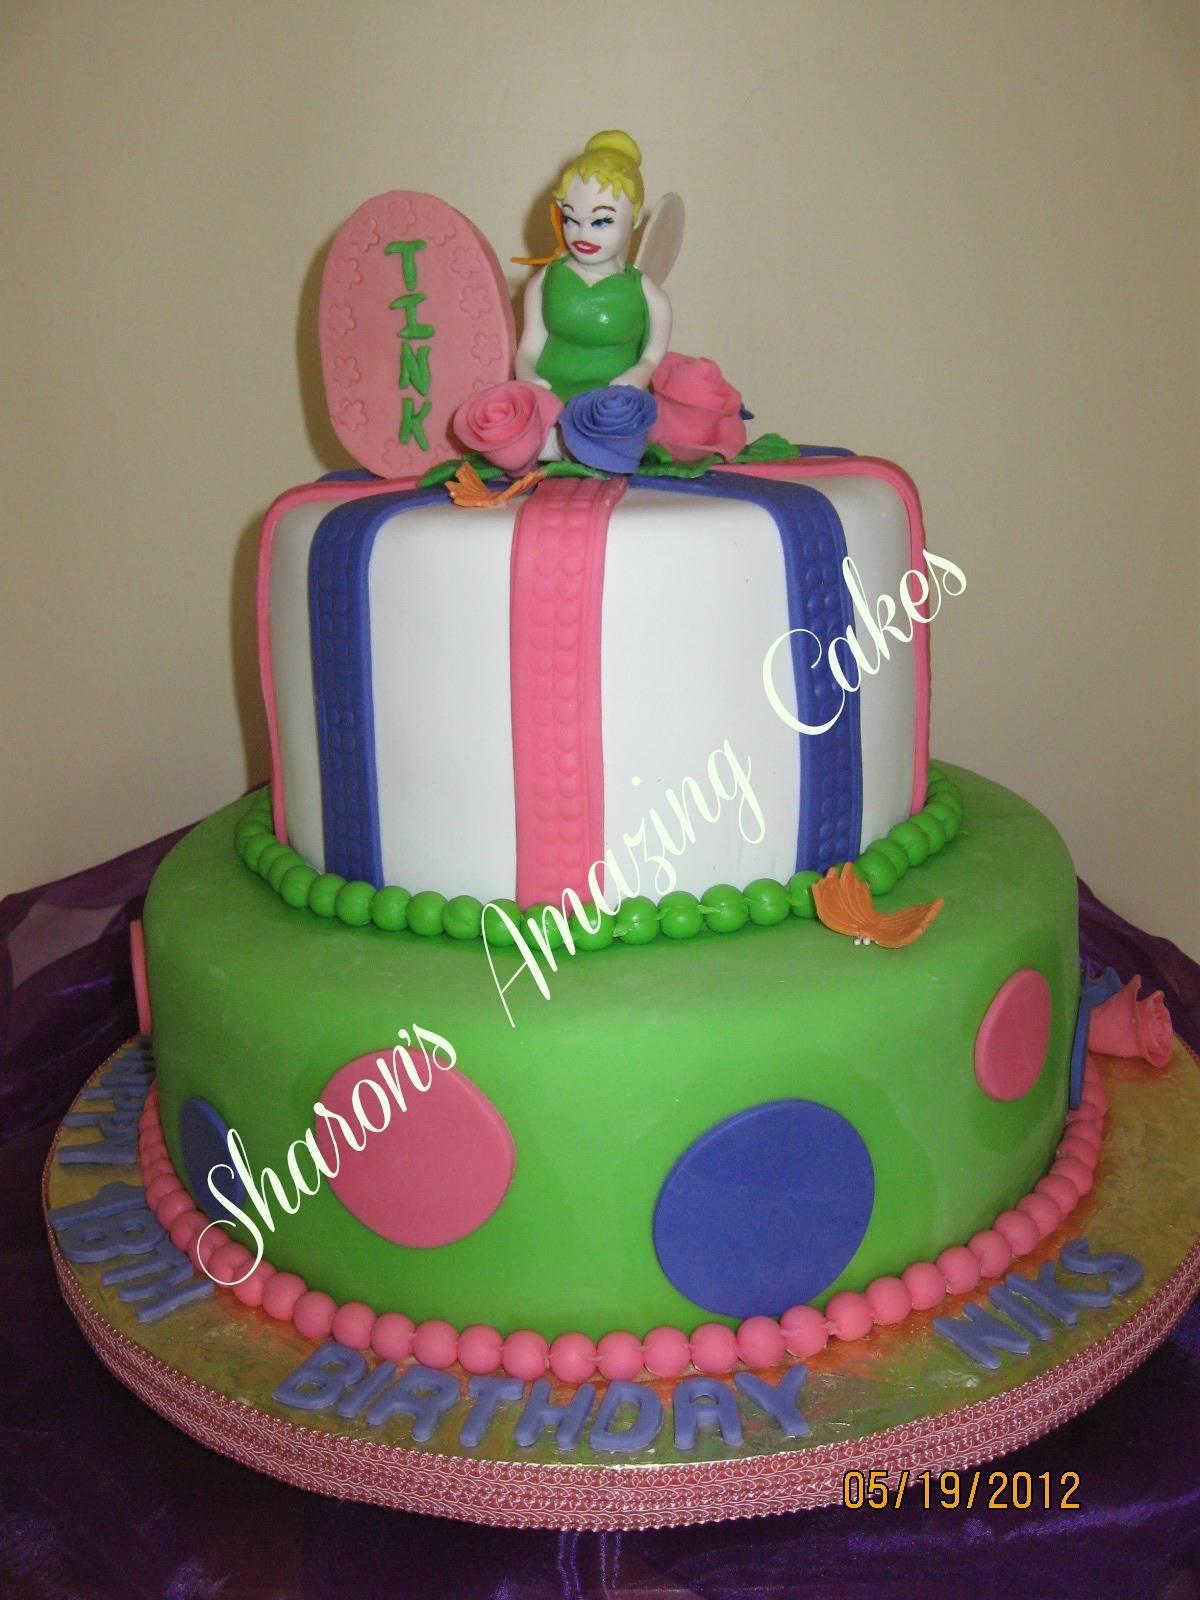 CAKE 39A1 - Tinkerbell Cake 2